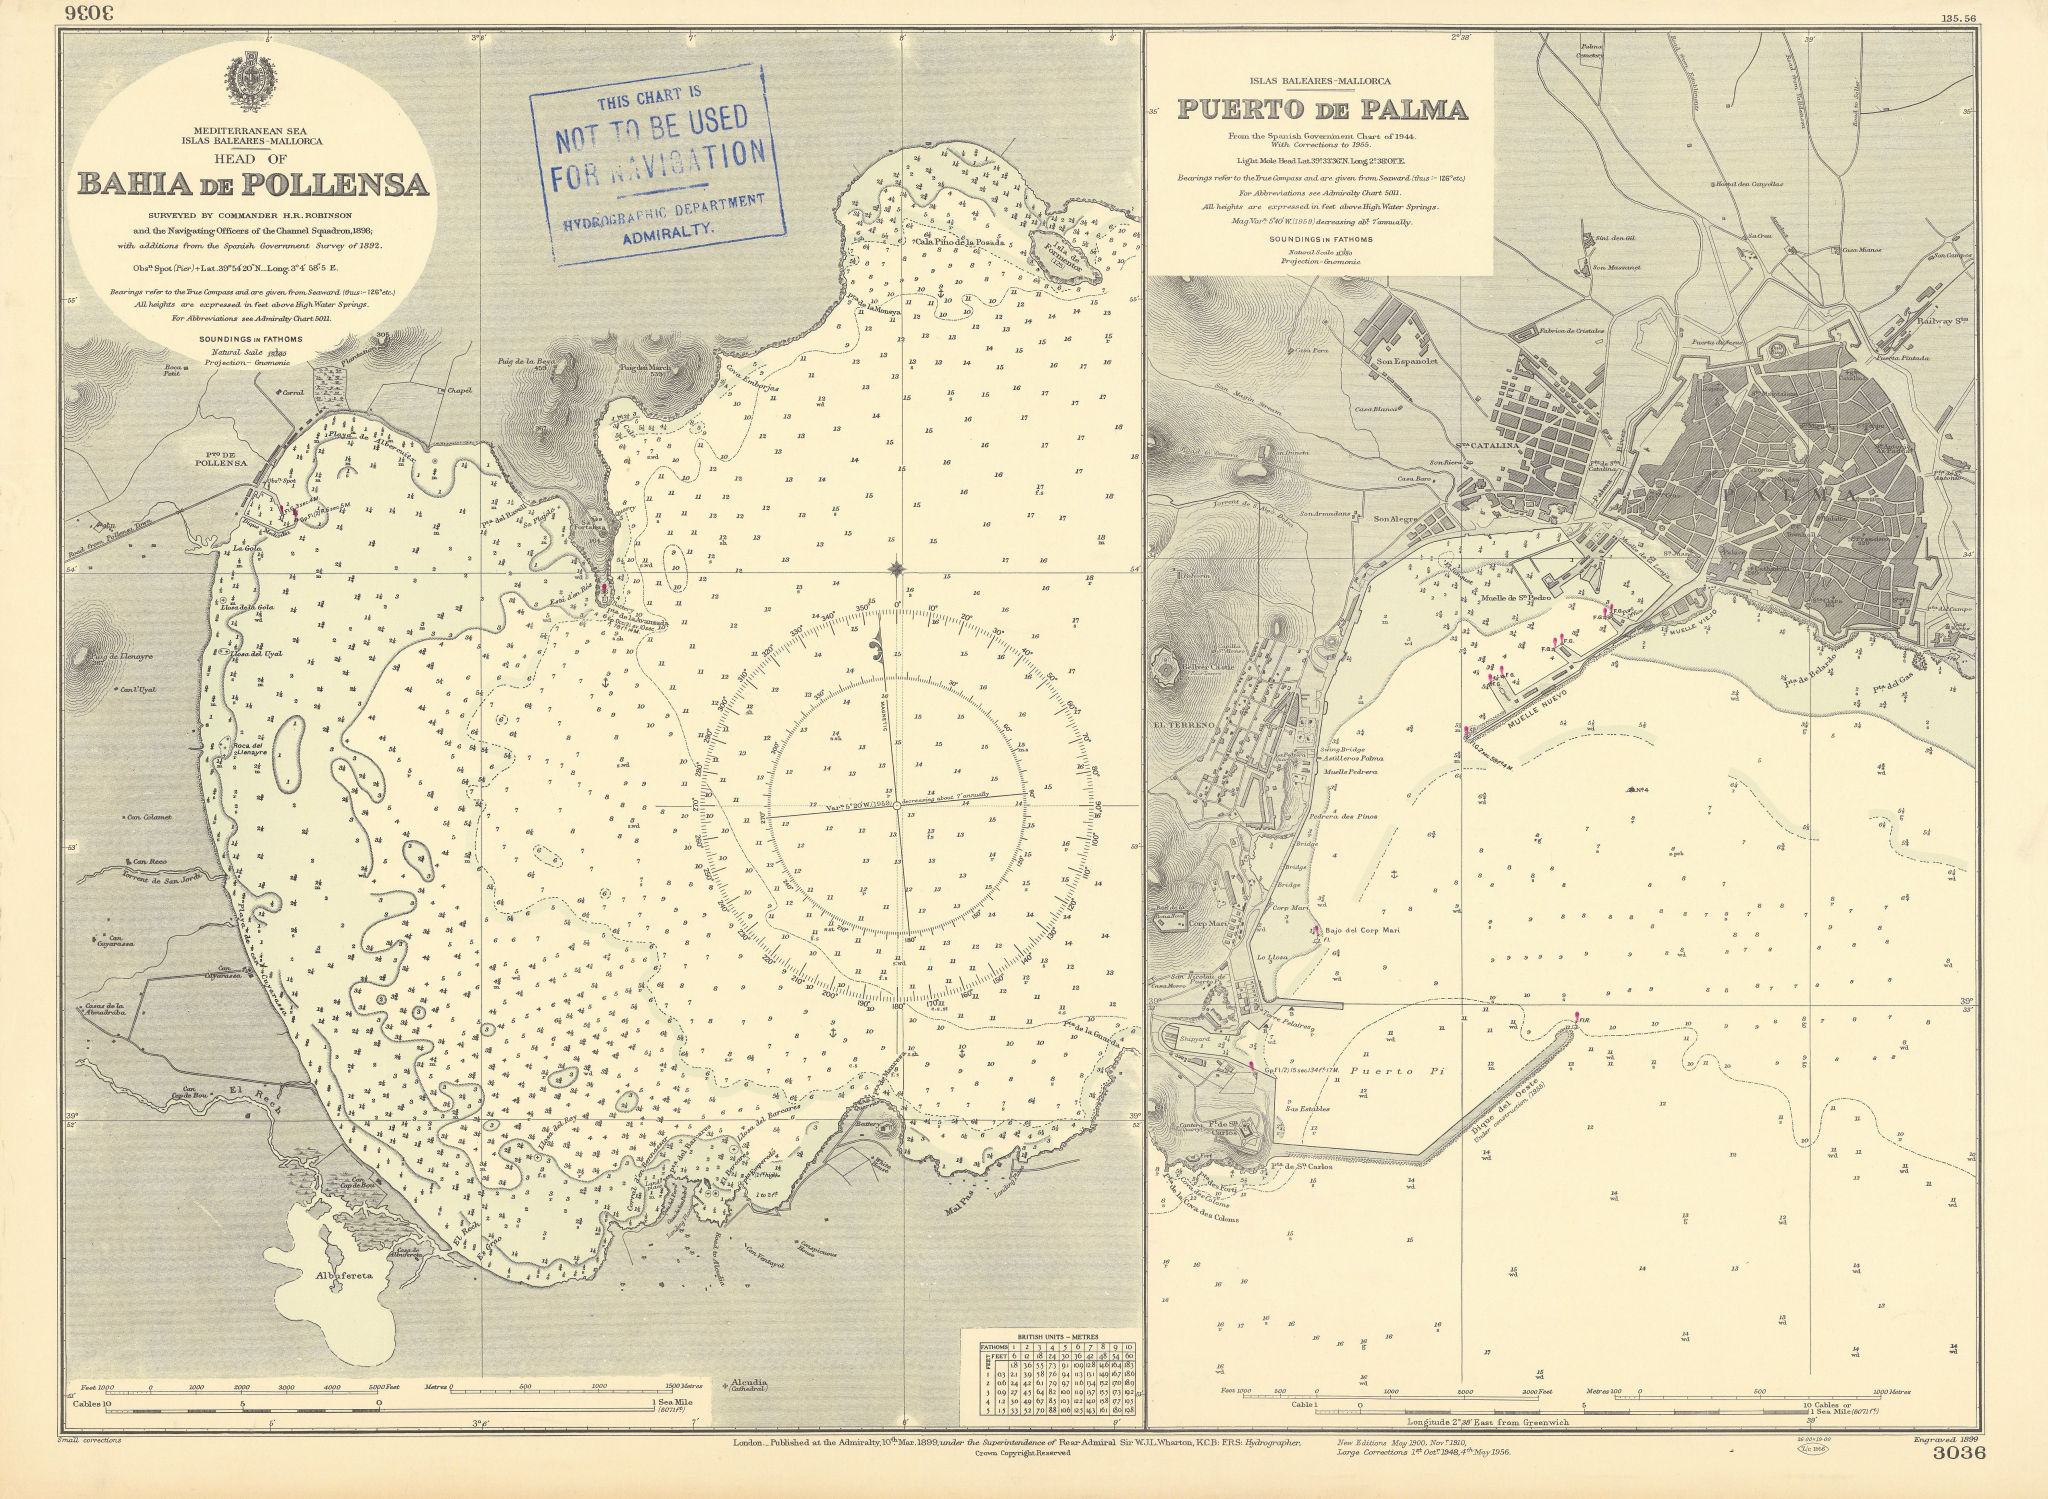 Mallorca Majorca ports Badia Pollença Palma ADMIRALTY sea chart 1899 (1956) map